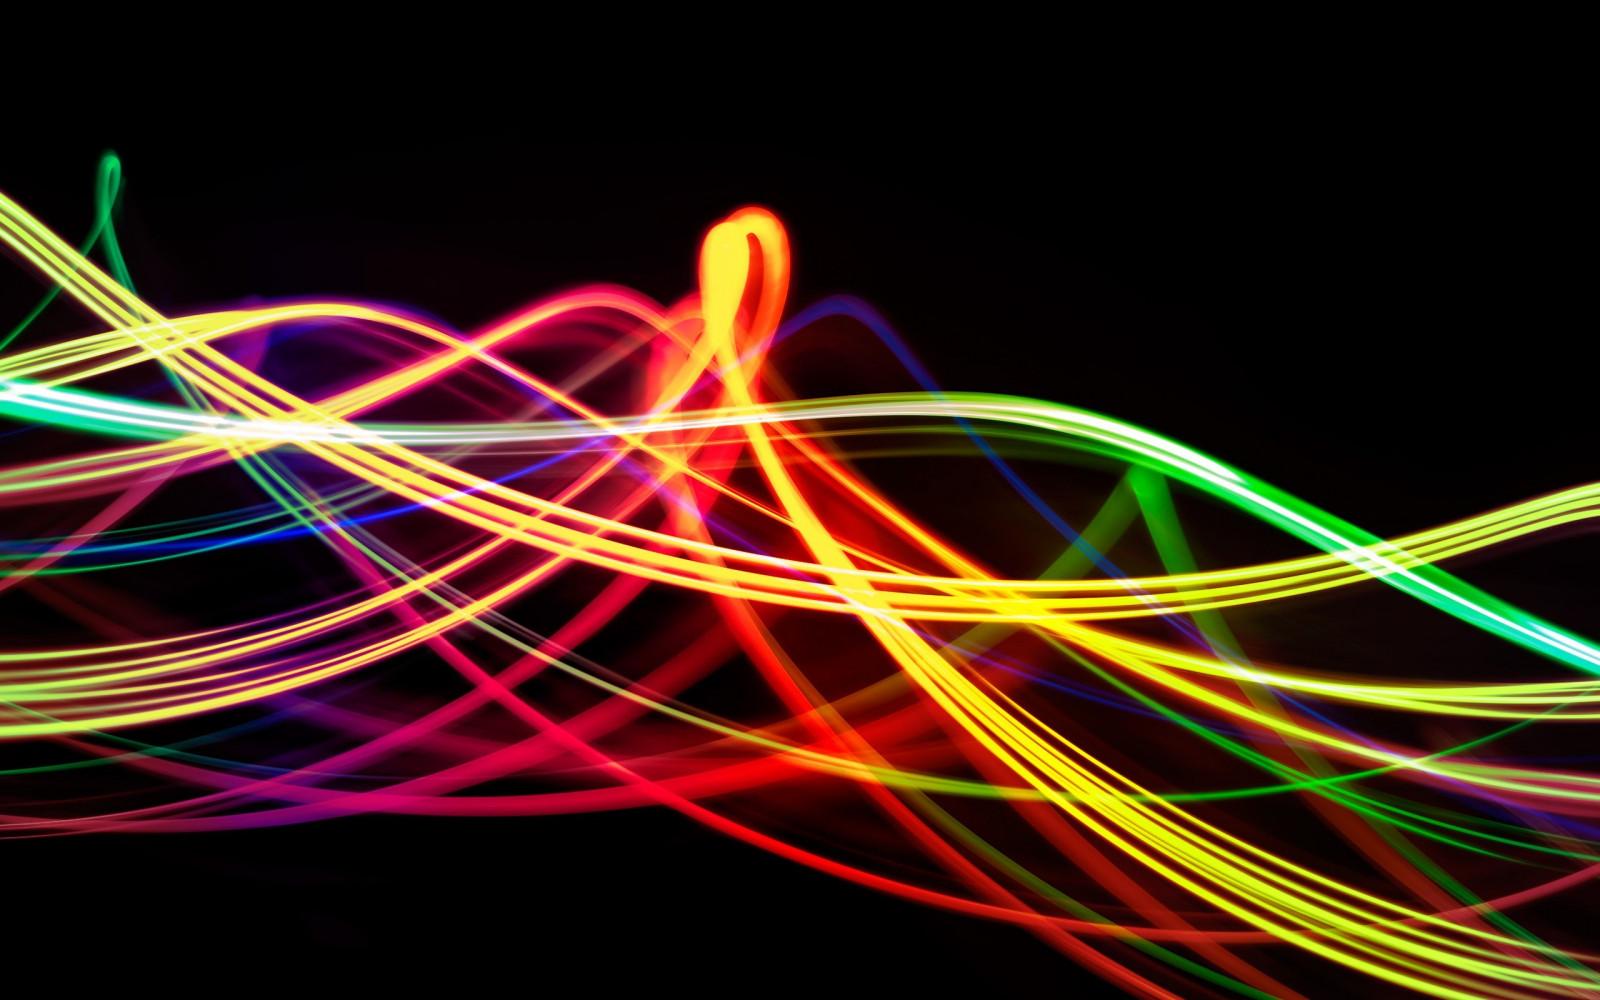 Wallpaper : lights, colorful, neon, abstract, circle ...